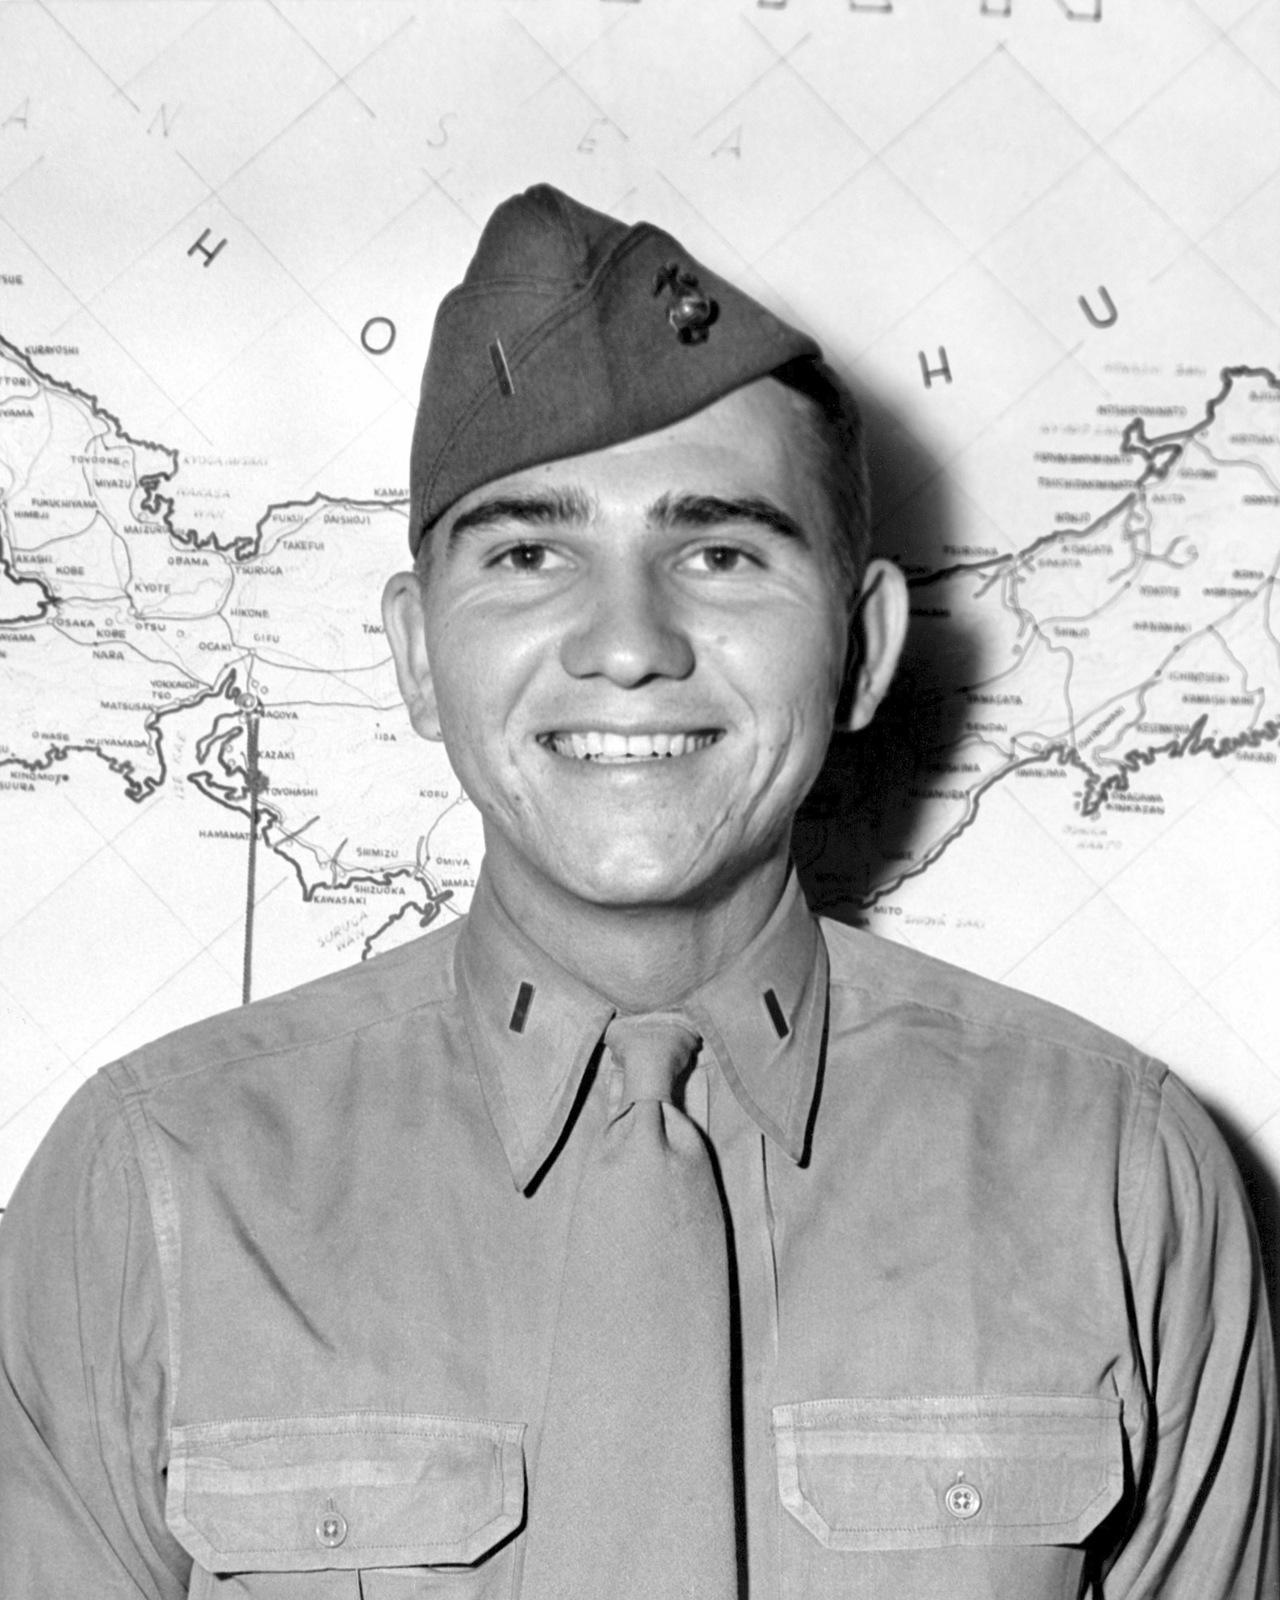 United States Marine Corps Second Lieutenant (2LT) Dean Casewell.  Official Portrait